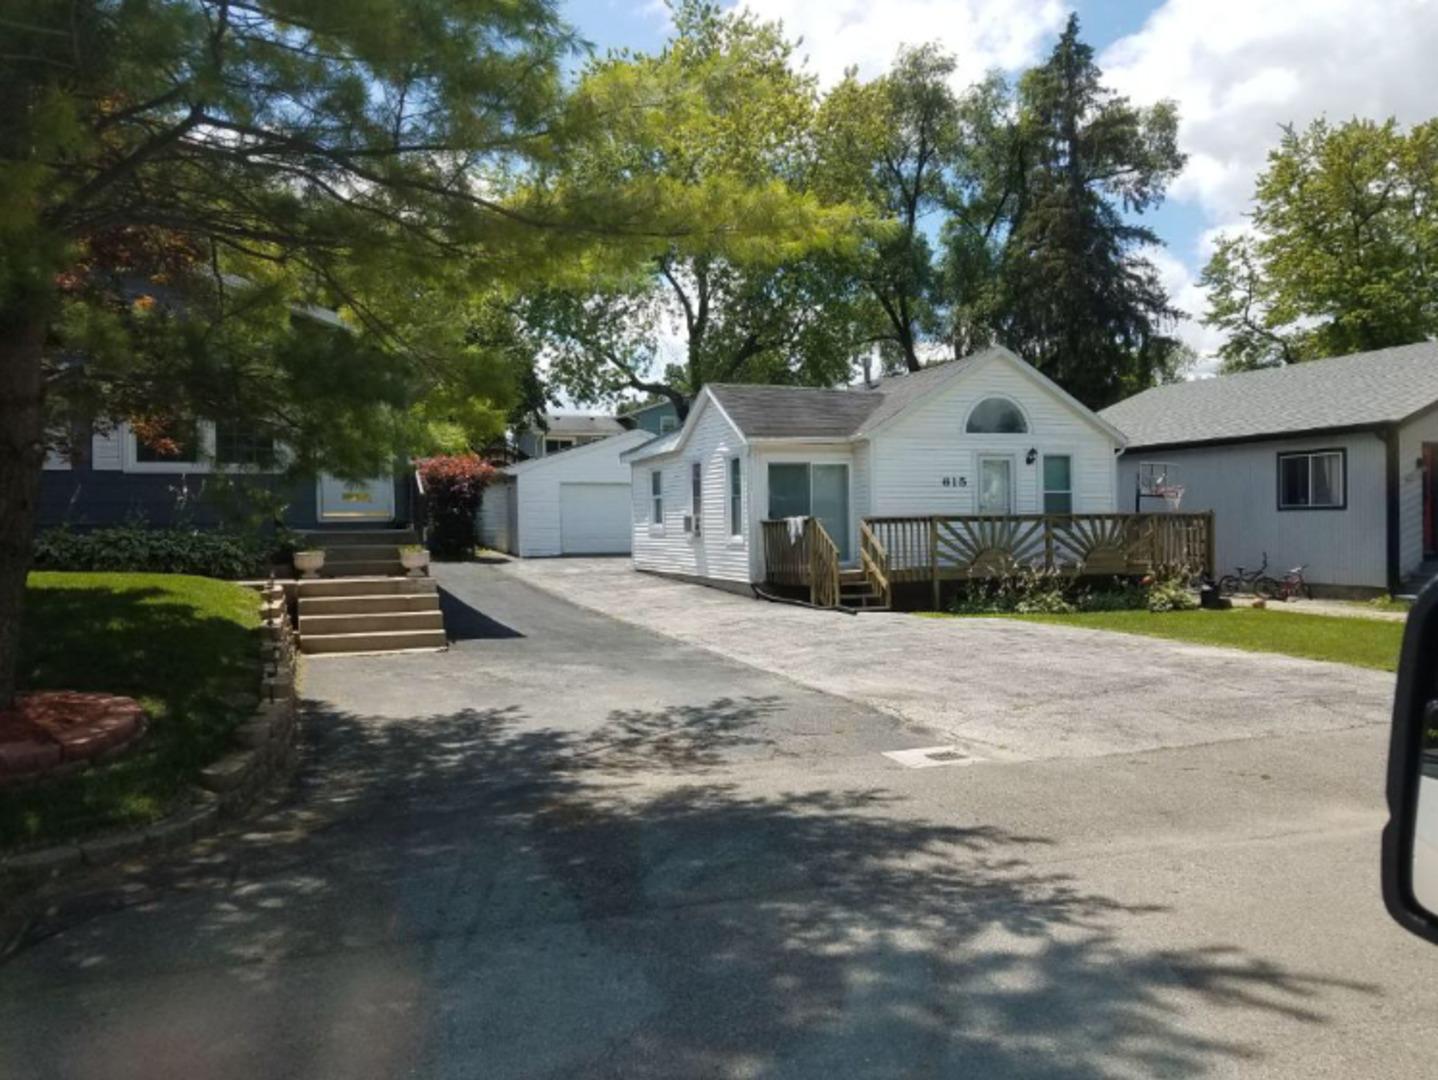 615 West Hillside Drive, Round Lake Beach, Illinois